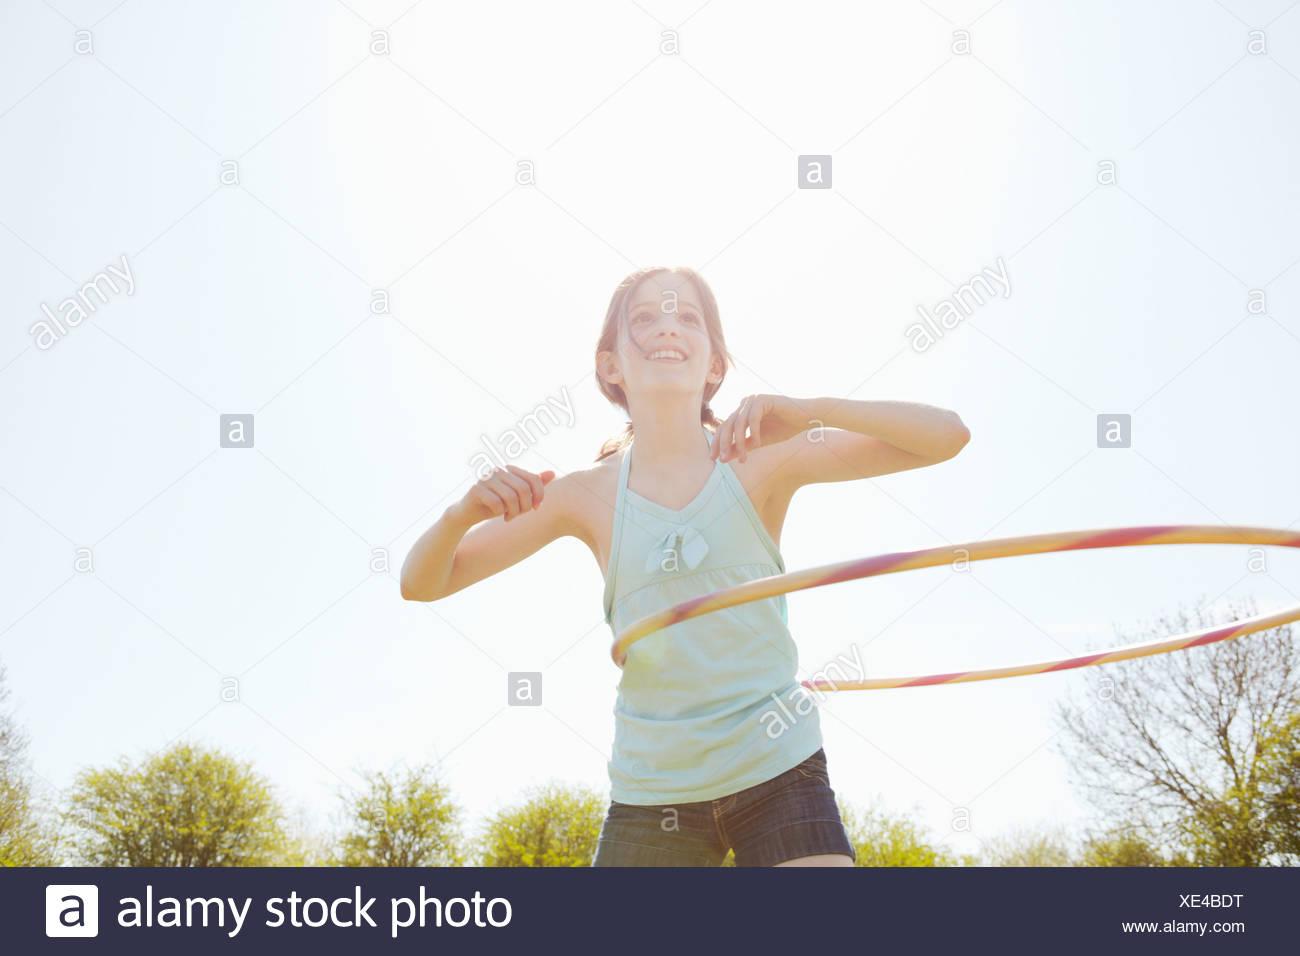 Girl playing with plastic hoop - Stock Image